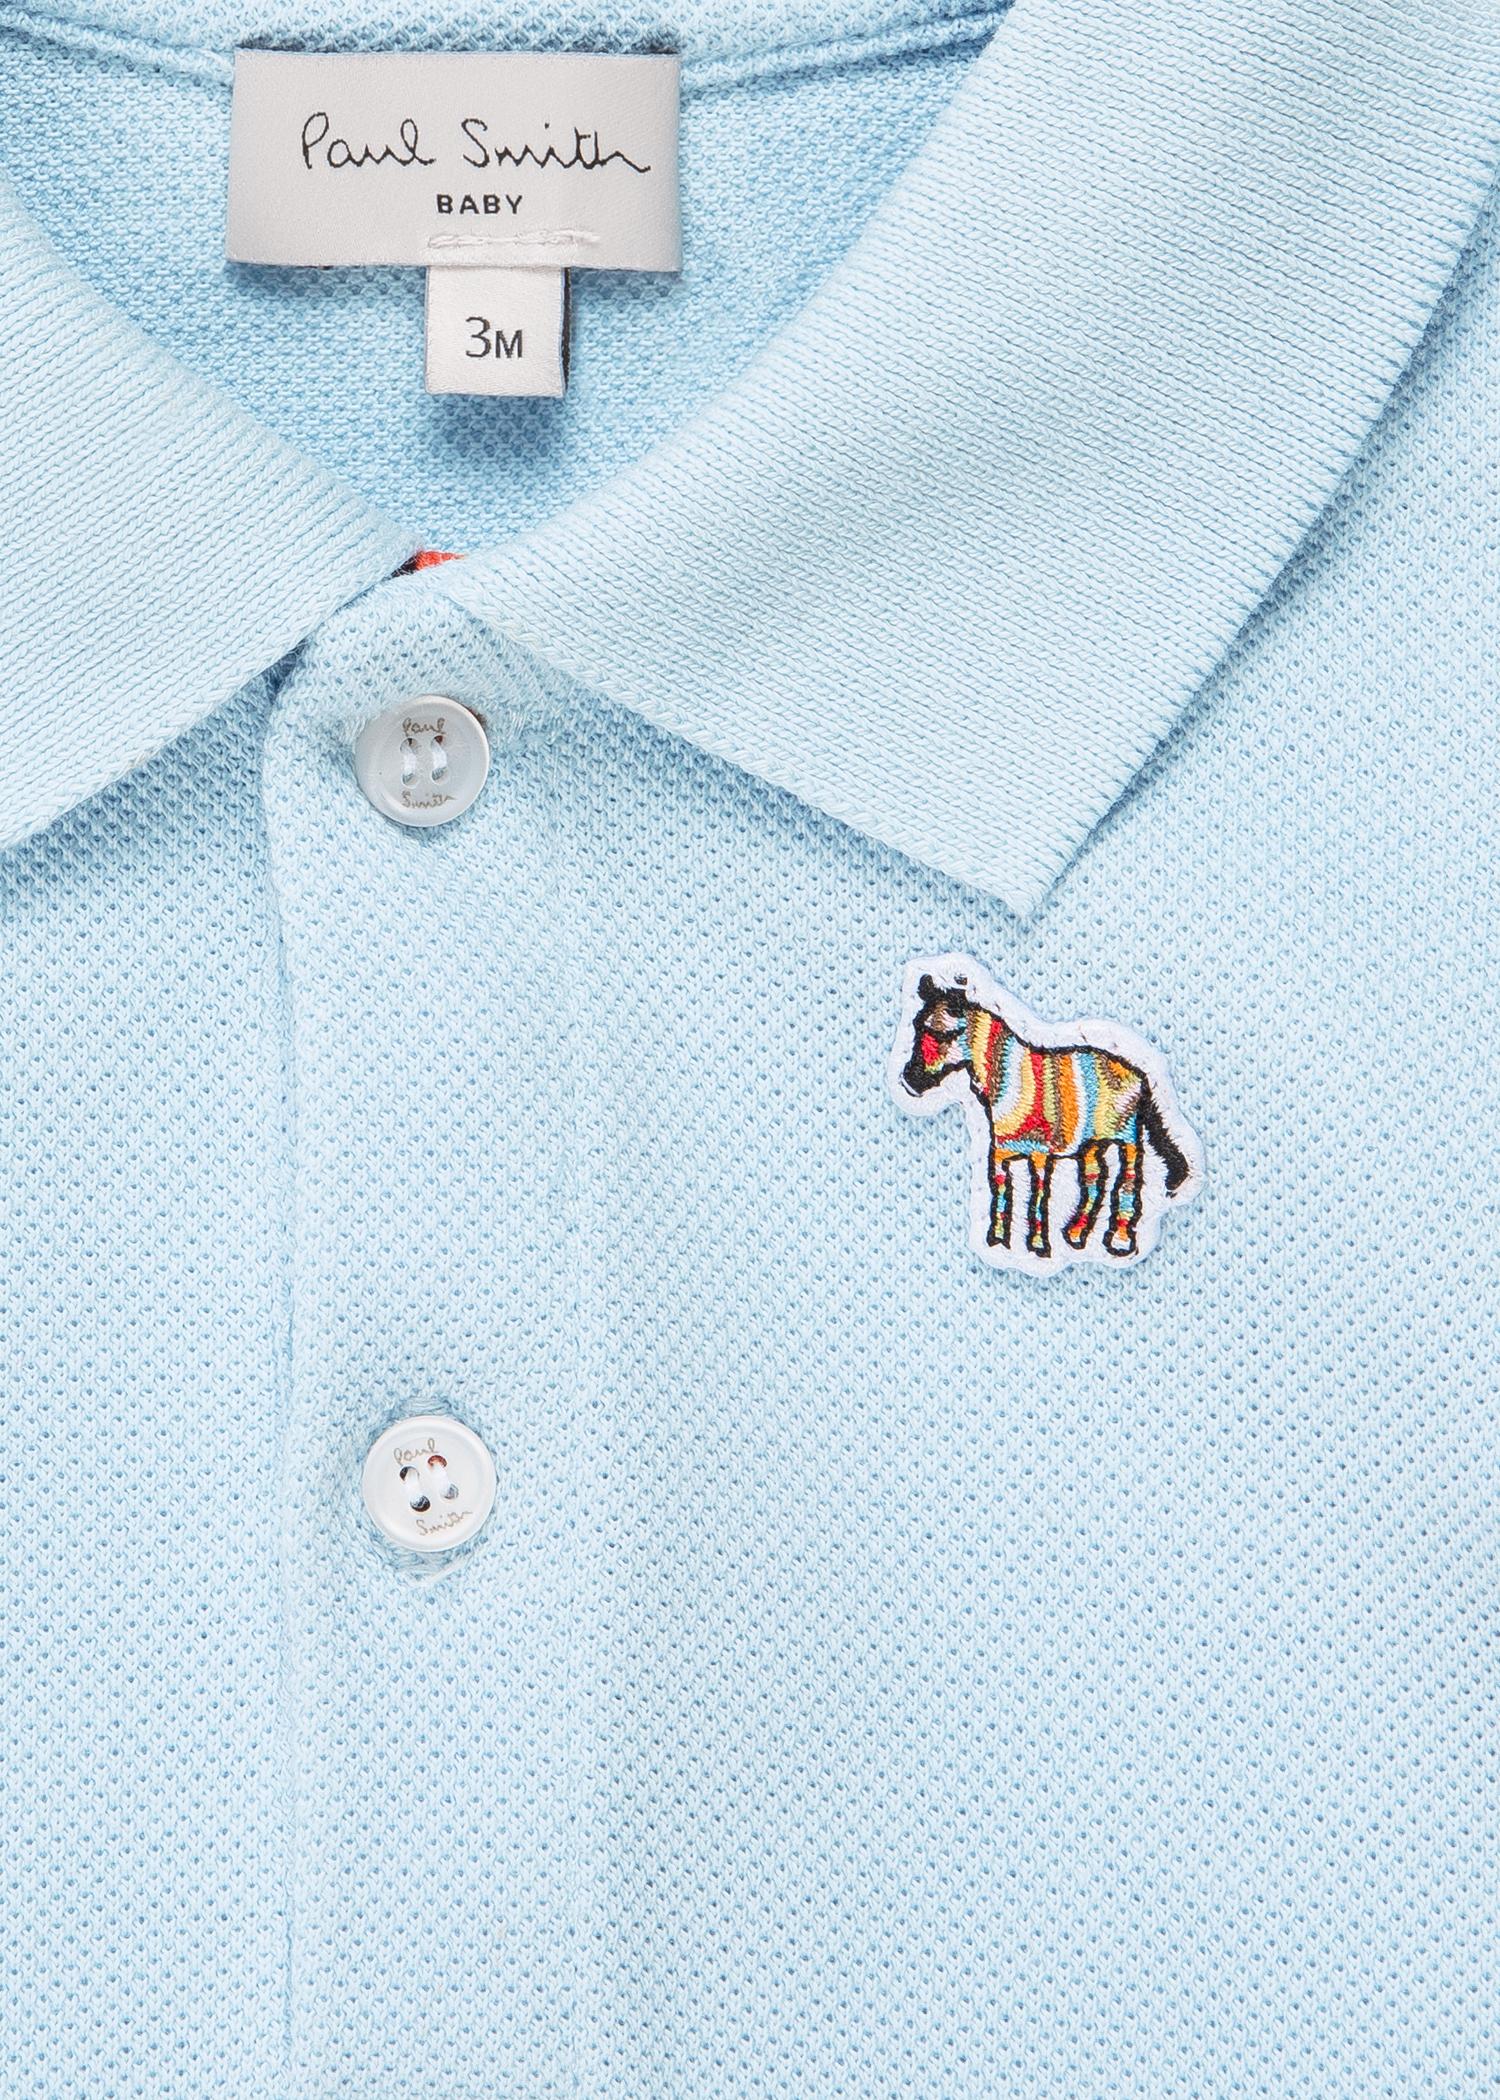 5292b93a6 Detail view - Baby Boys  Light Blue  Zebra  Logo Polo Shirt Paul Smith